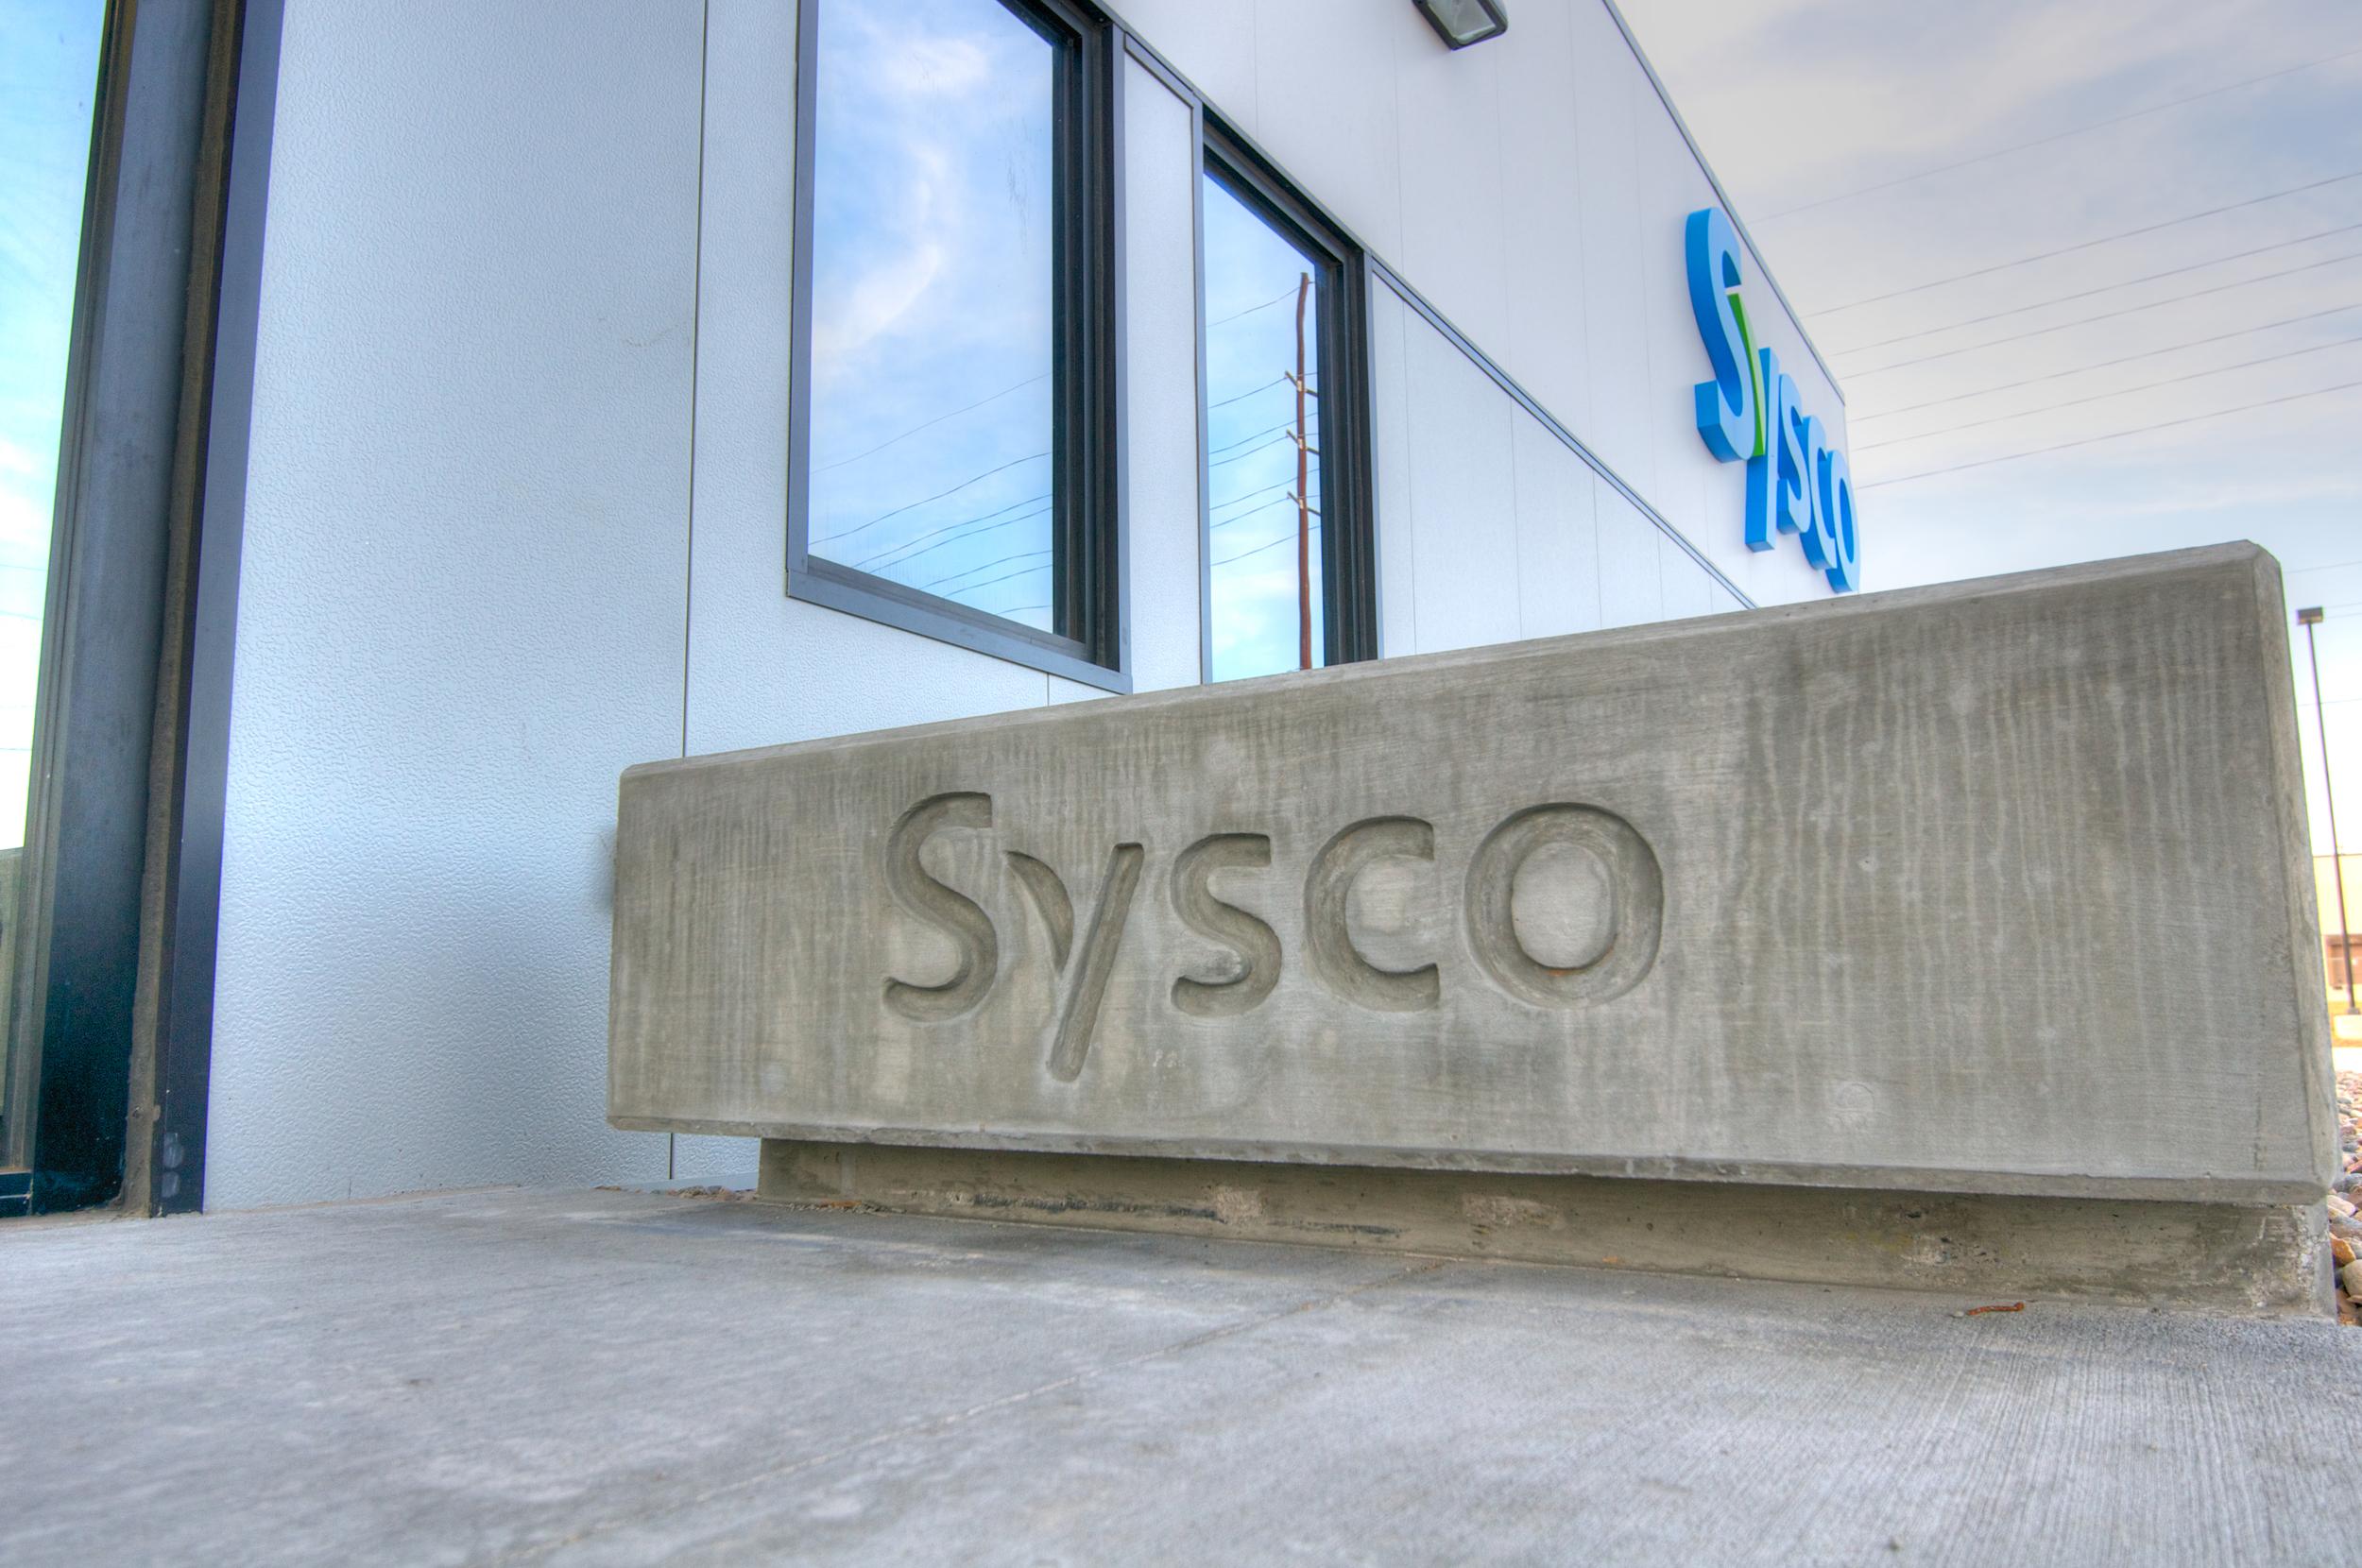 Sysco Concrete Sign